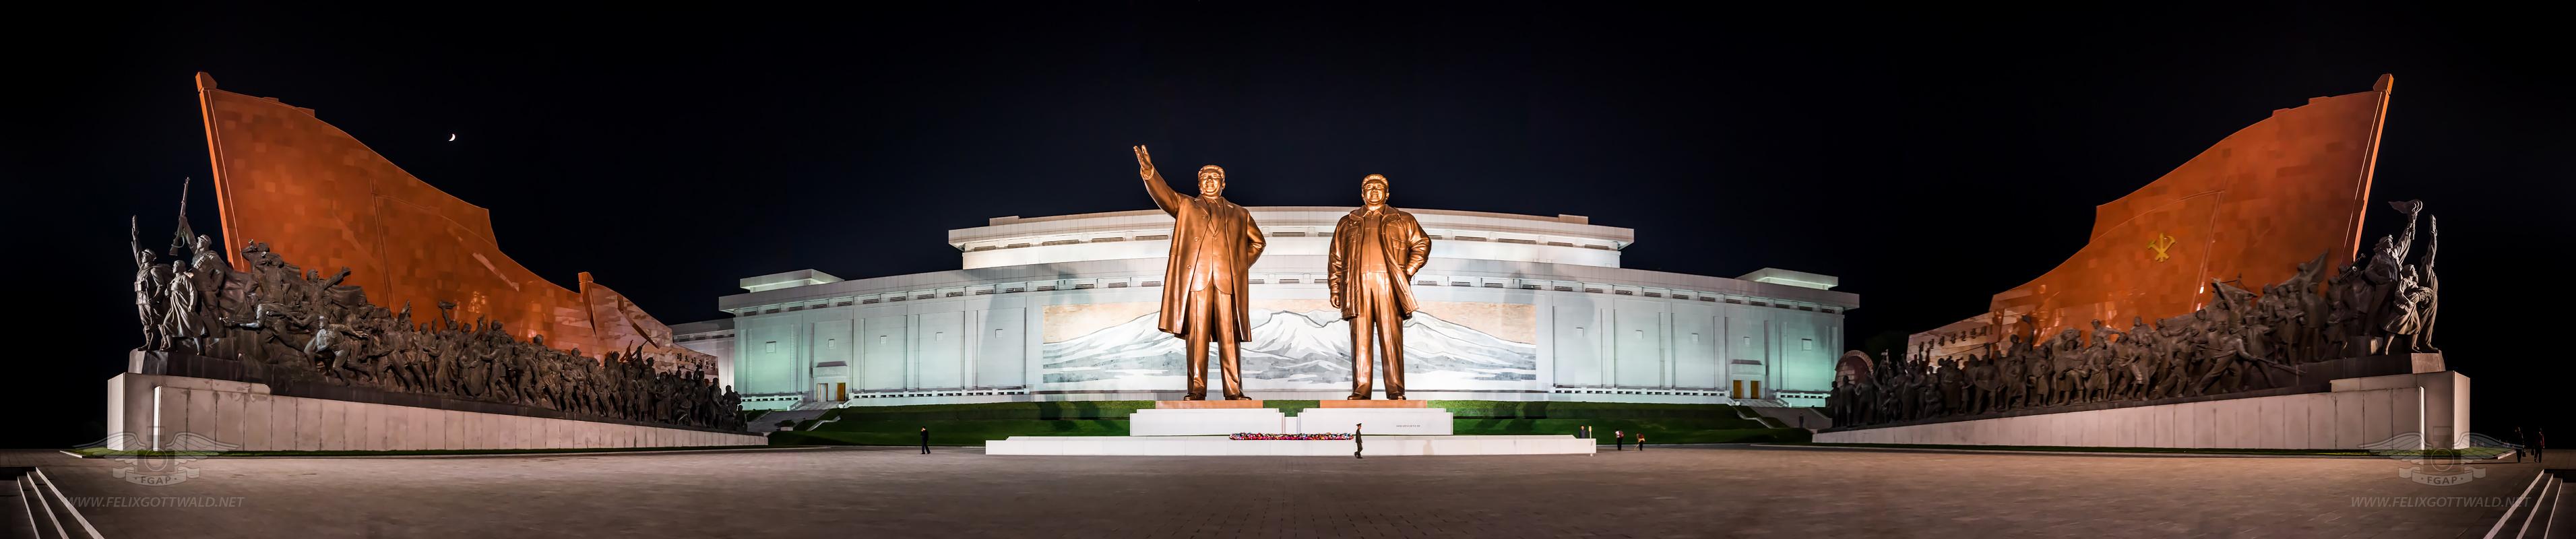 Pyongyang at night - Mansudae Mansu Hill Grand Monument - Panorama